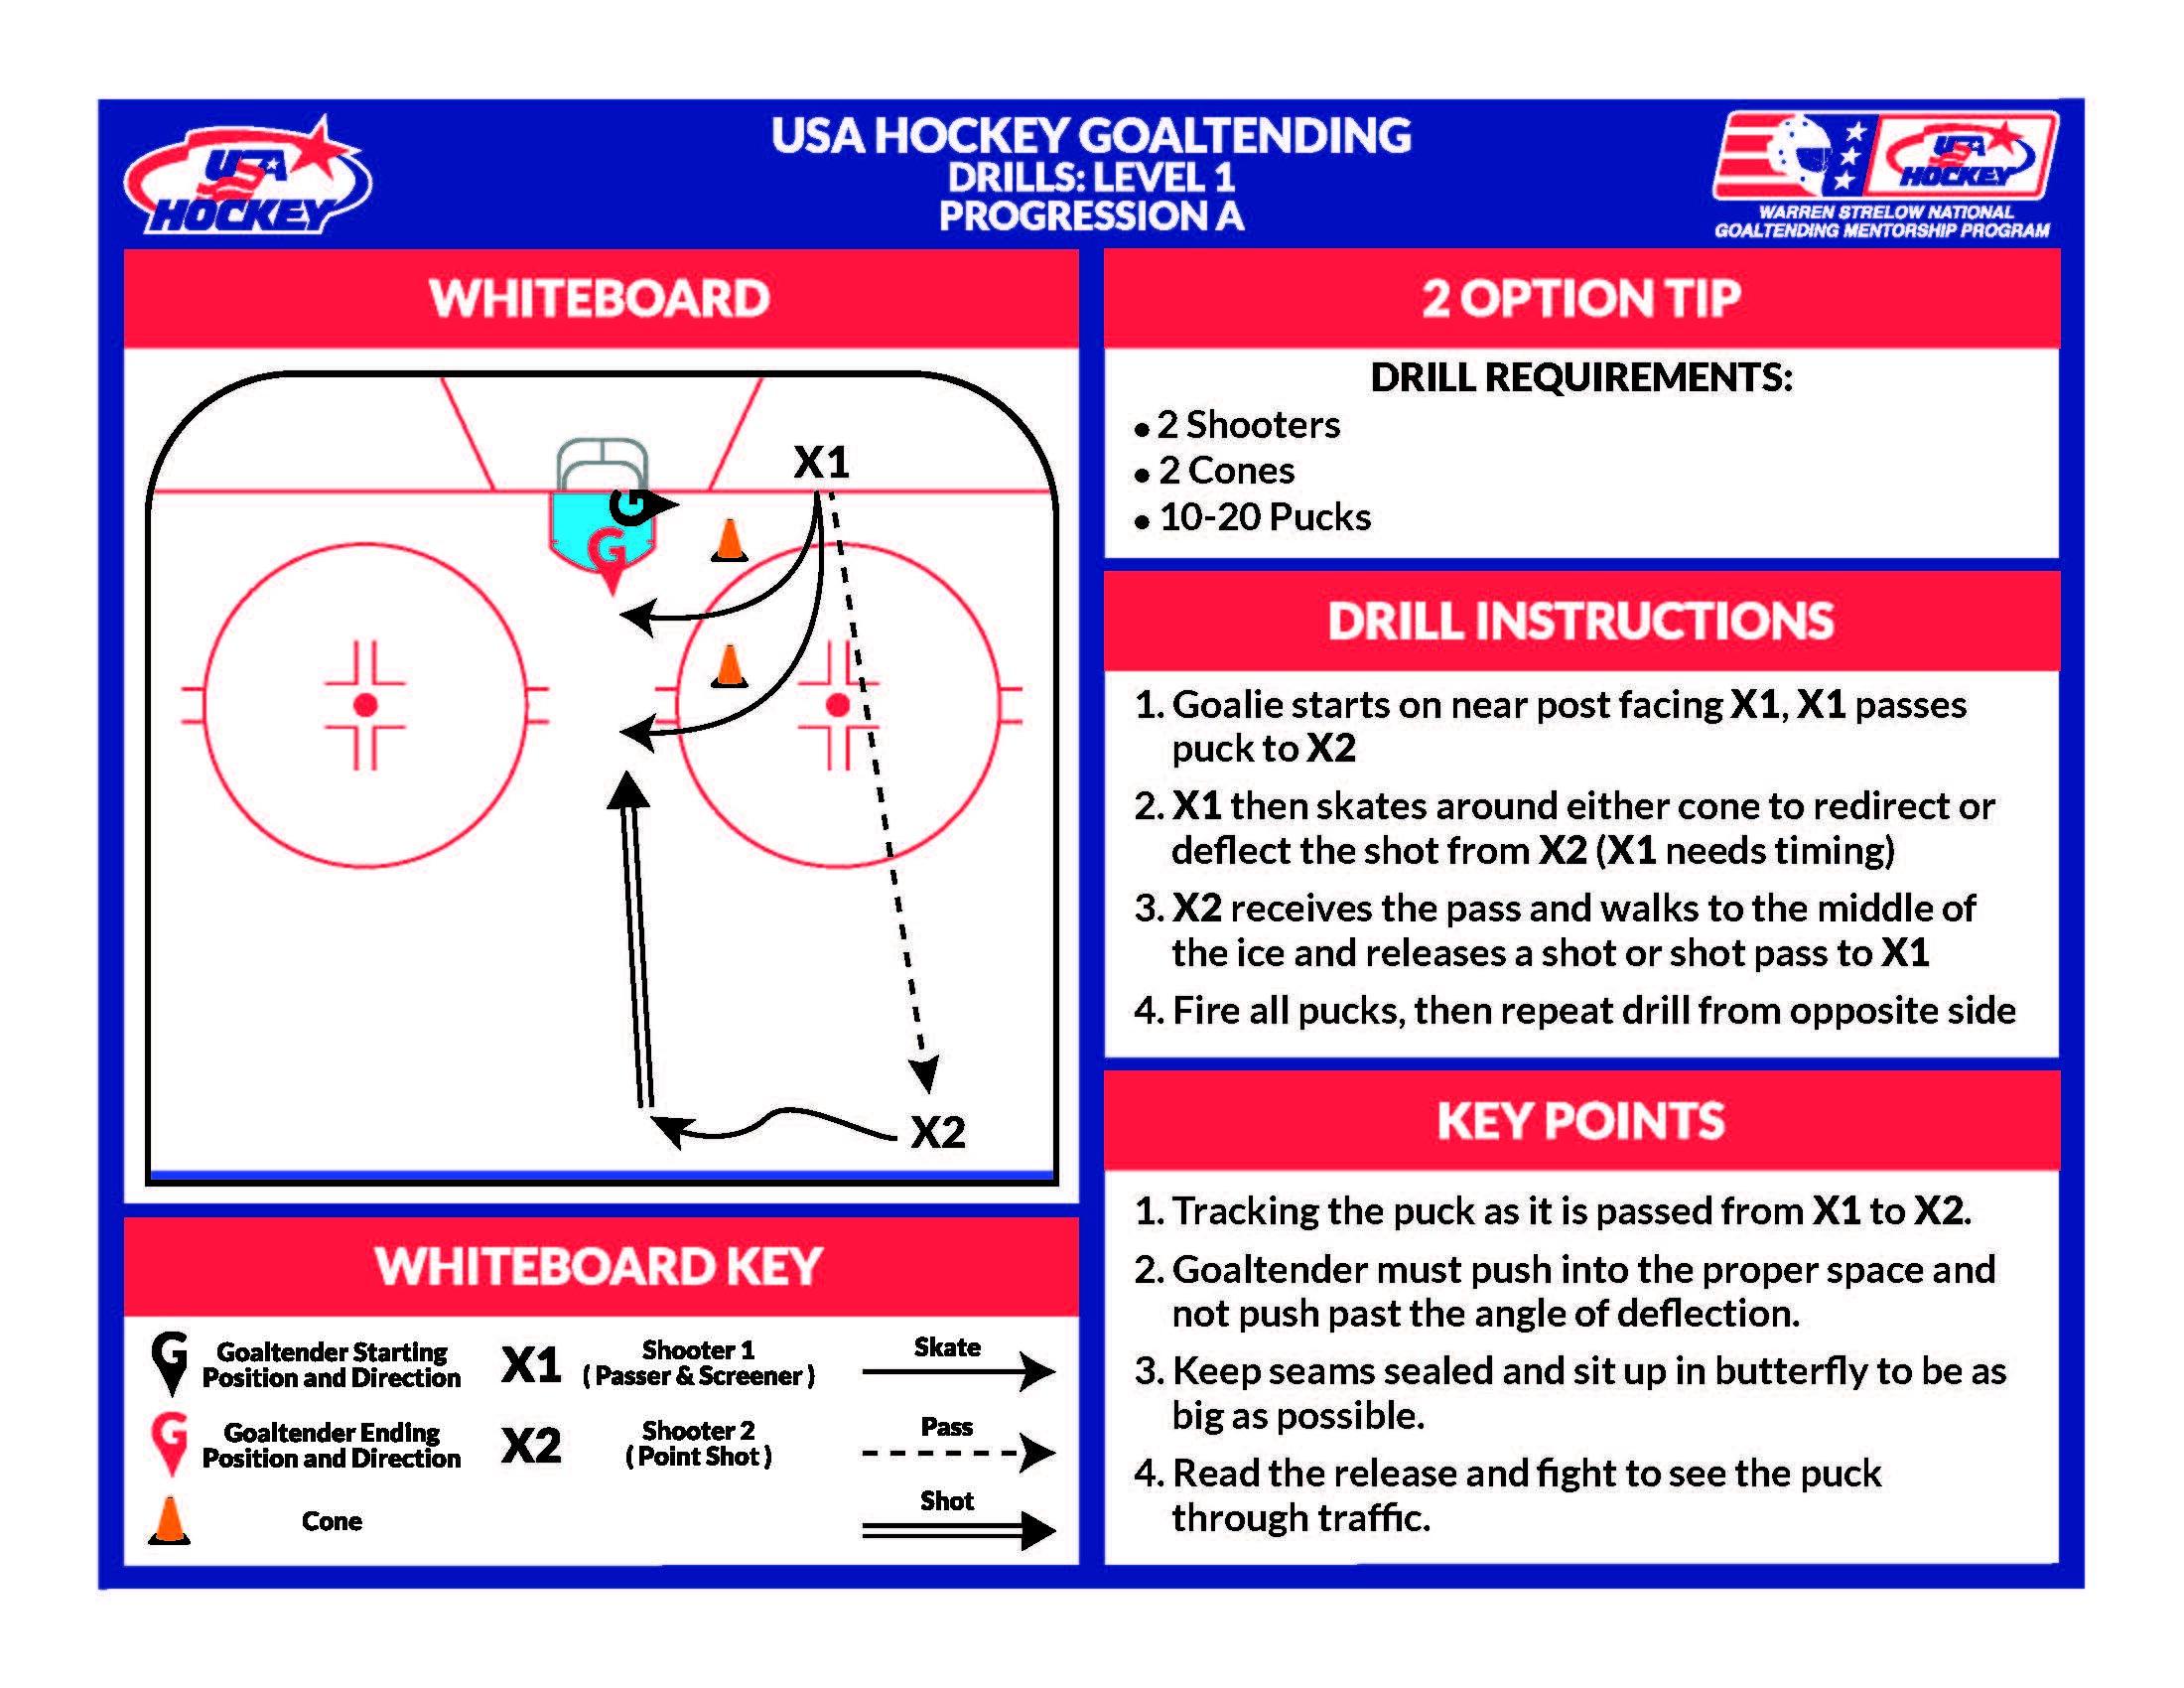 USA Hockey Drill Form